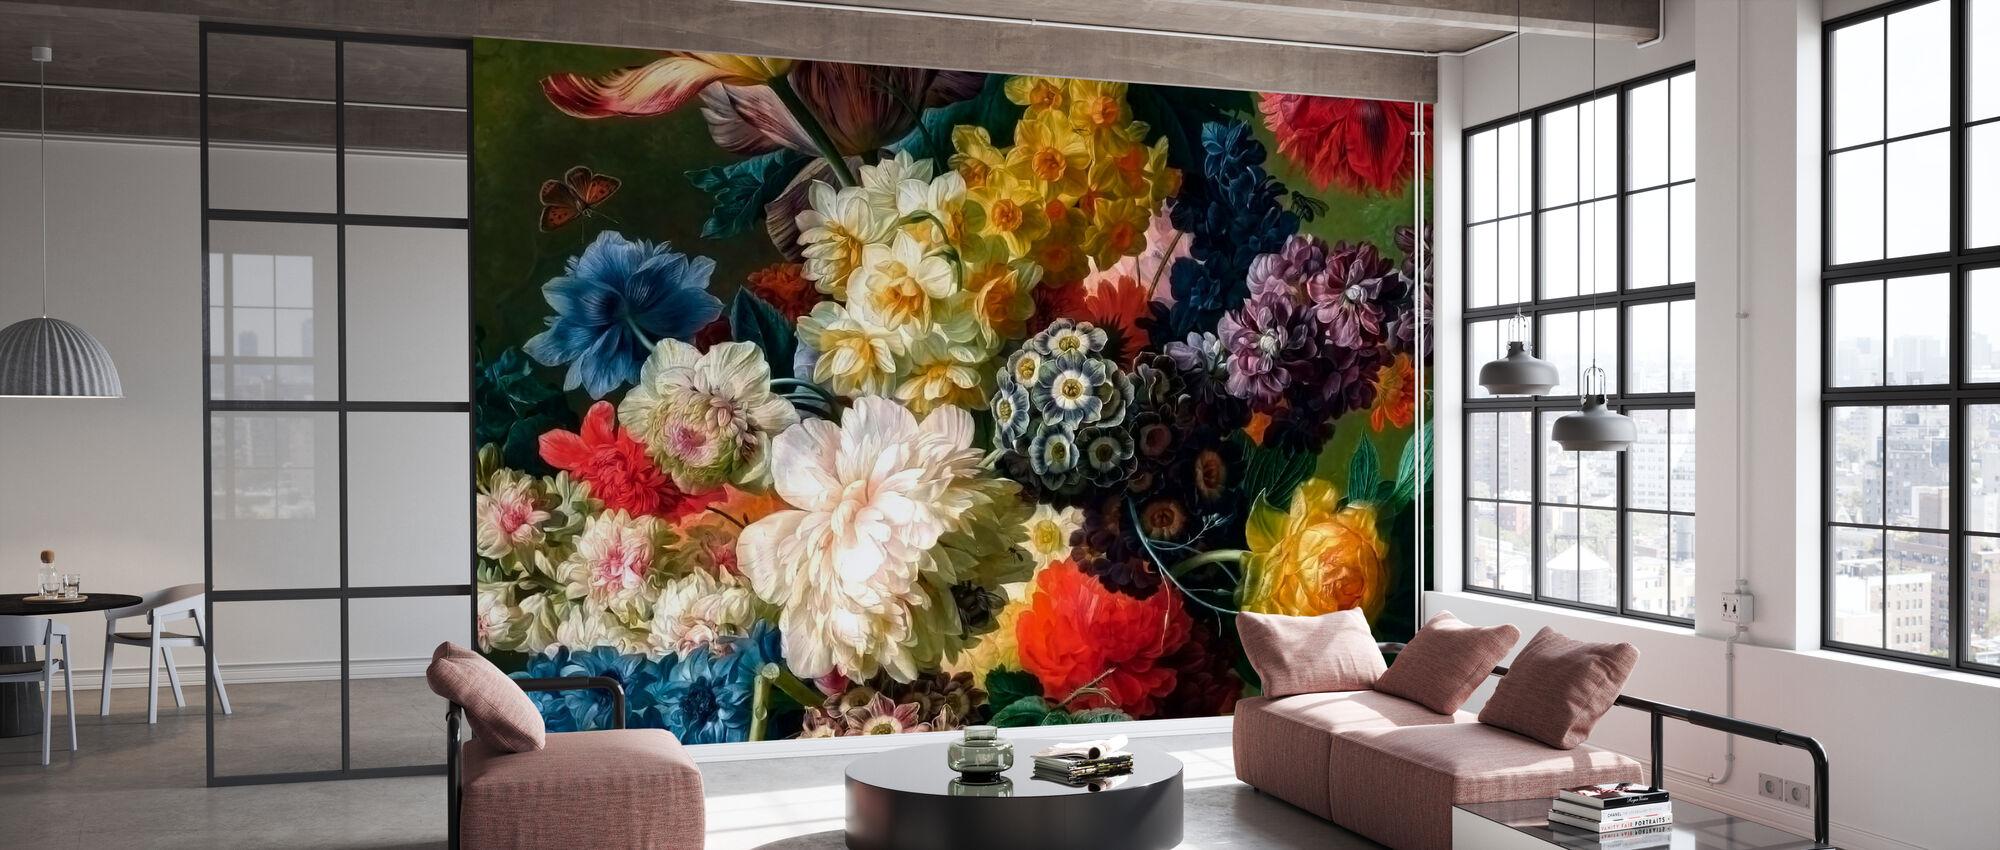 Flower Madness - Wallpaper - Office